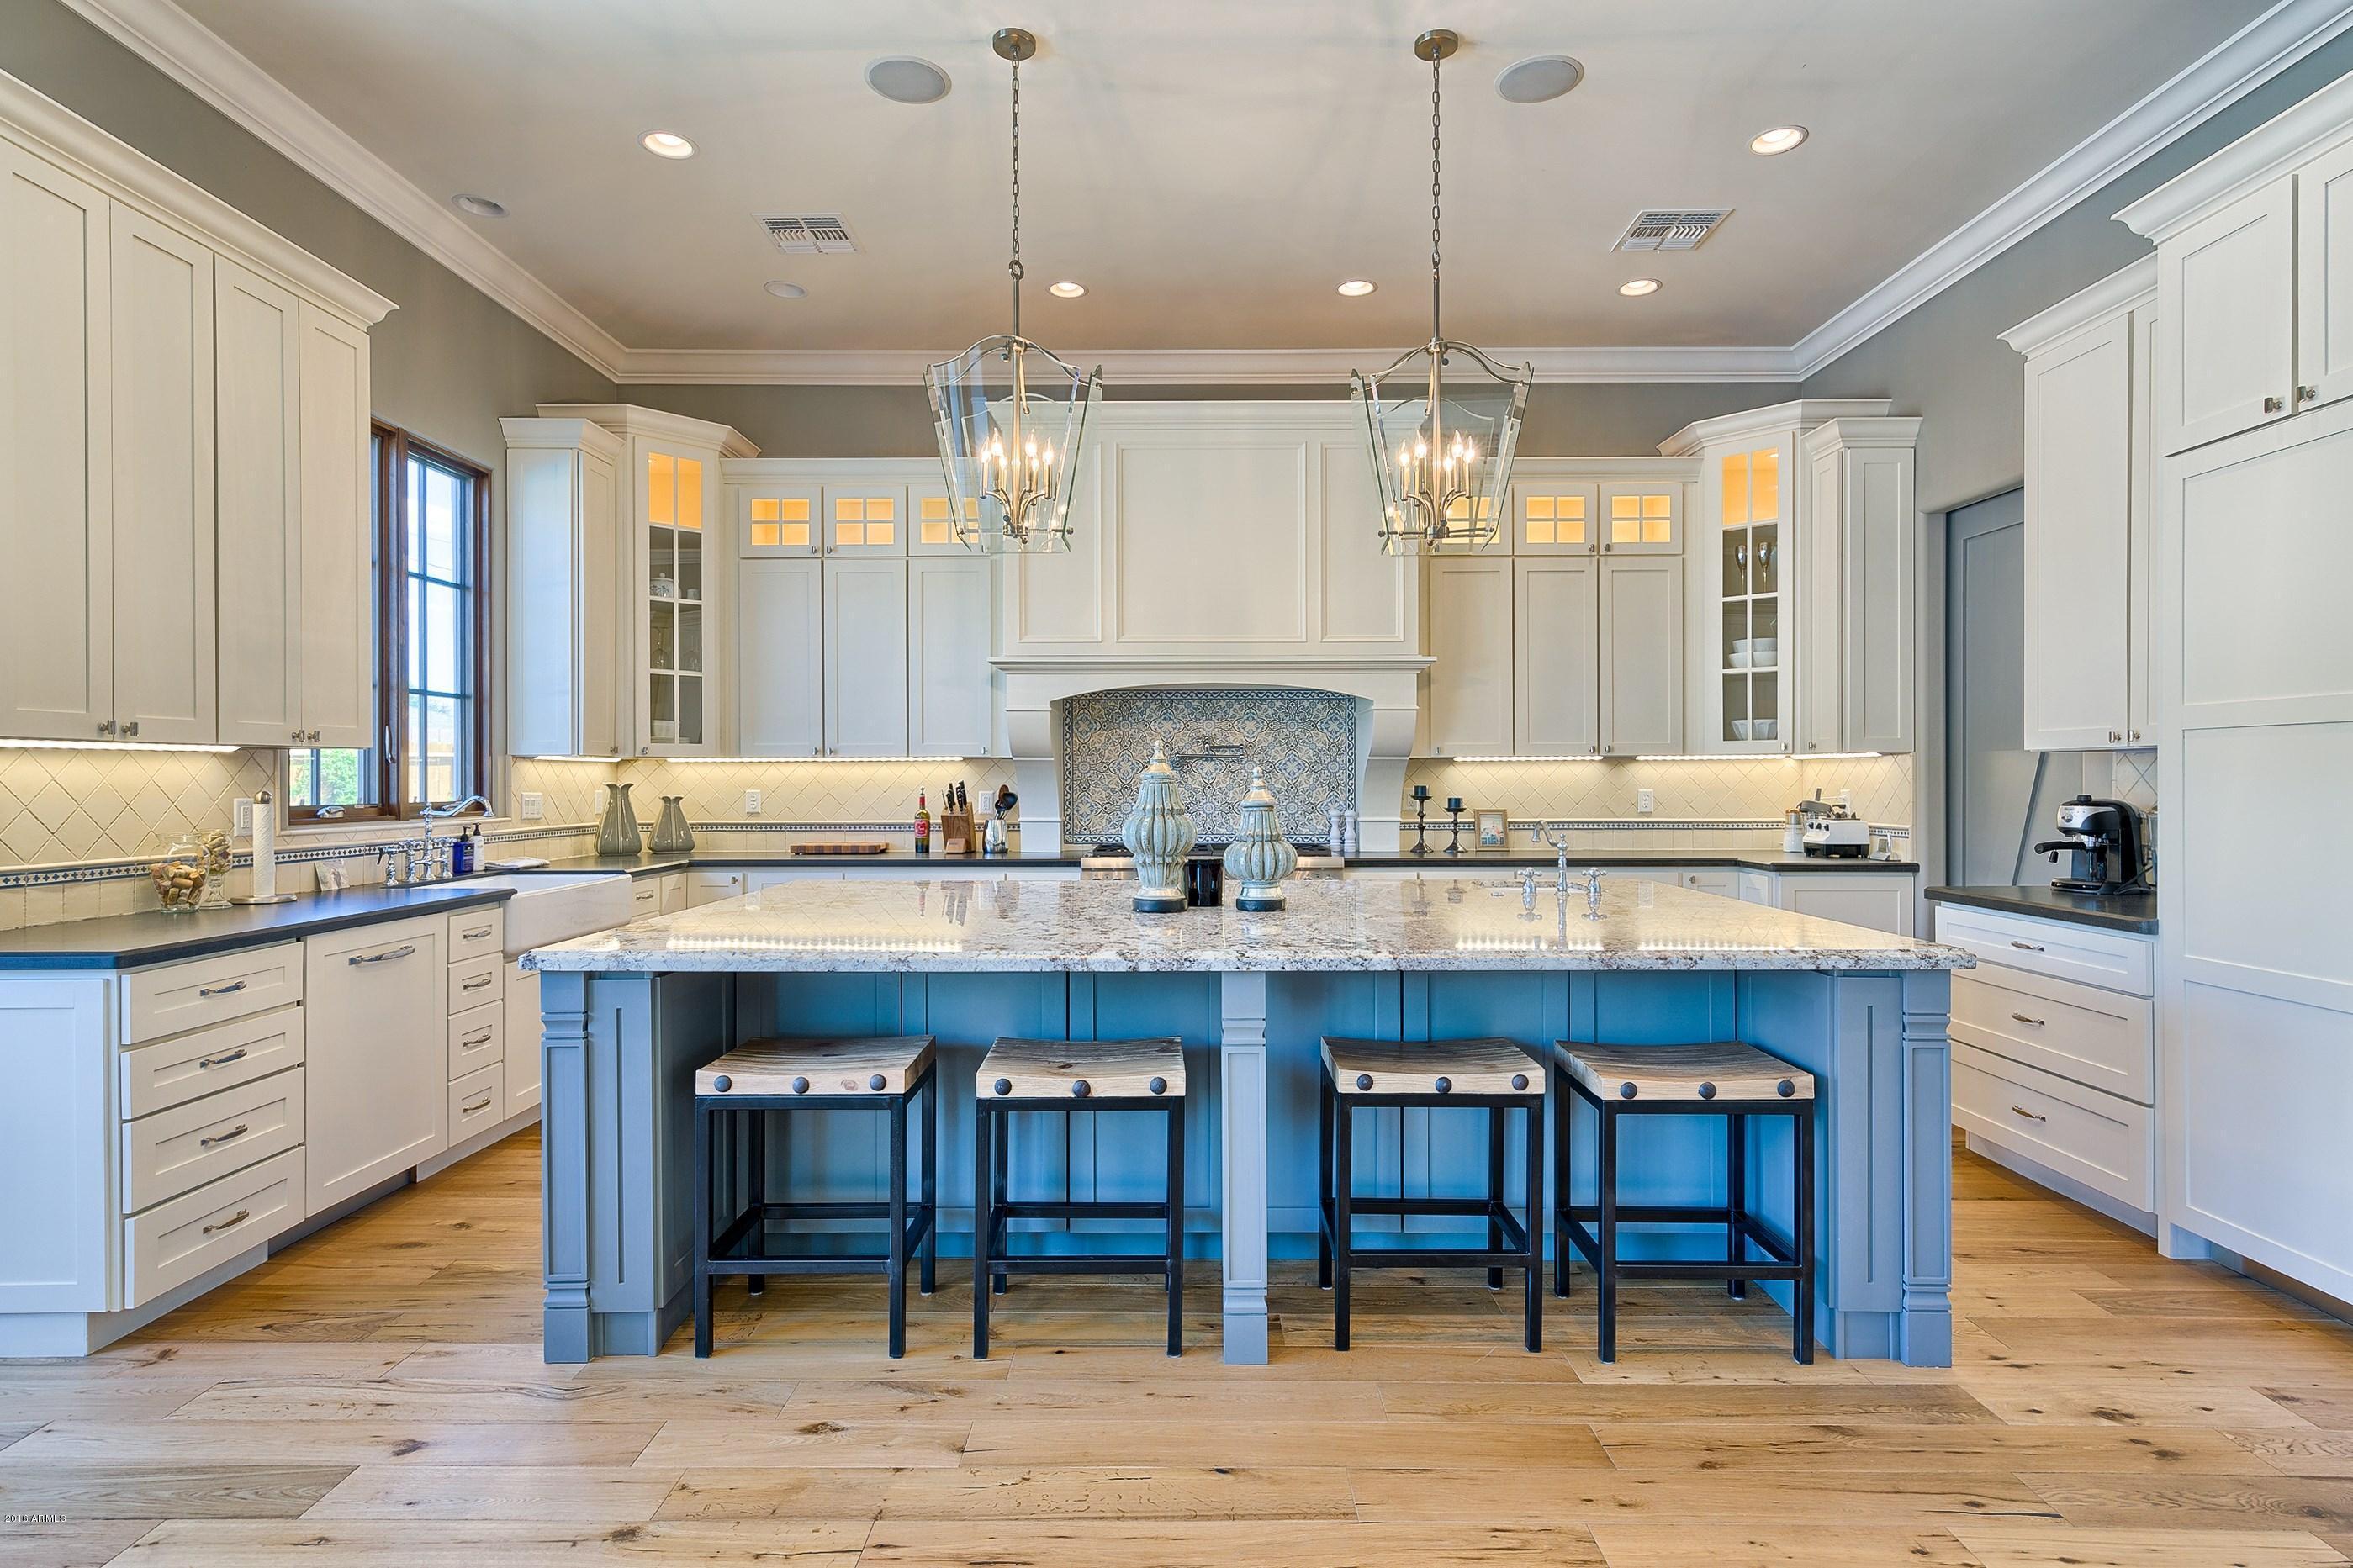 top kitchen trends - pop of color